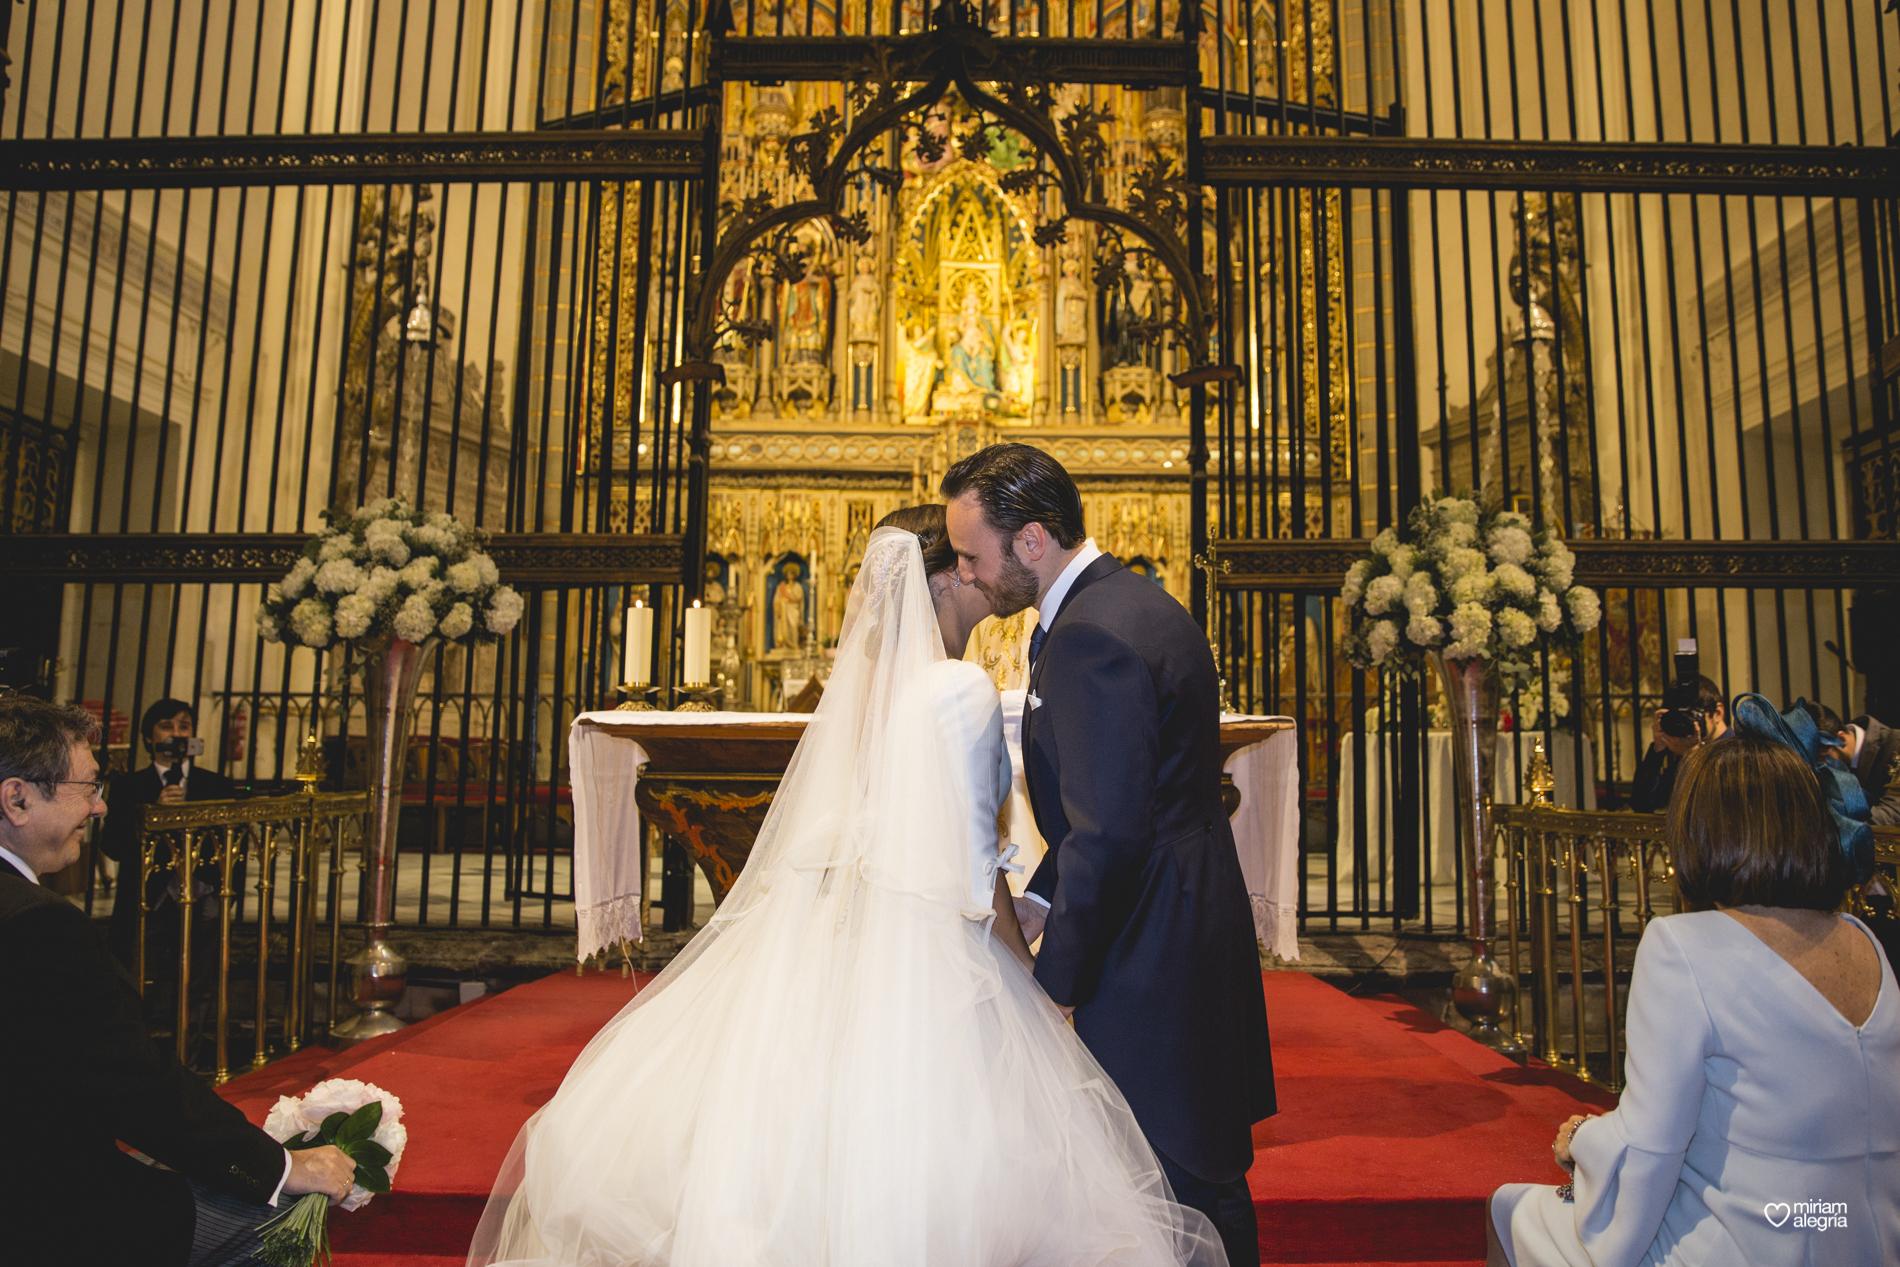 boda-en-la-catedral-de-murcia-miriam-alegria-fotografos-boda-murcia-45